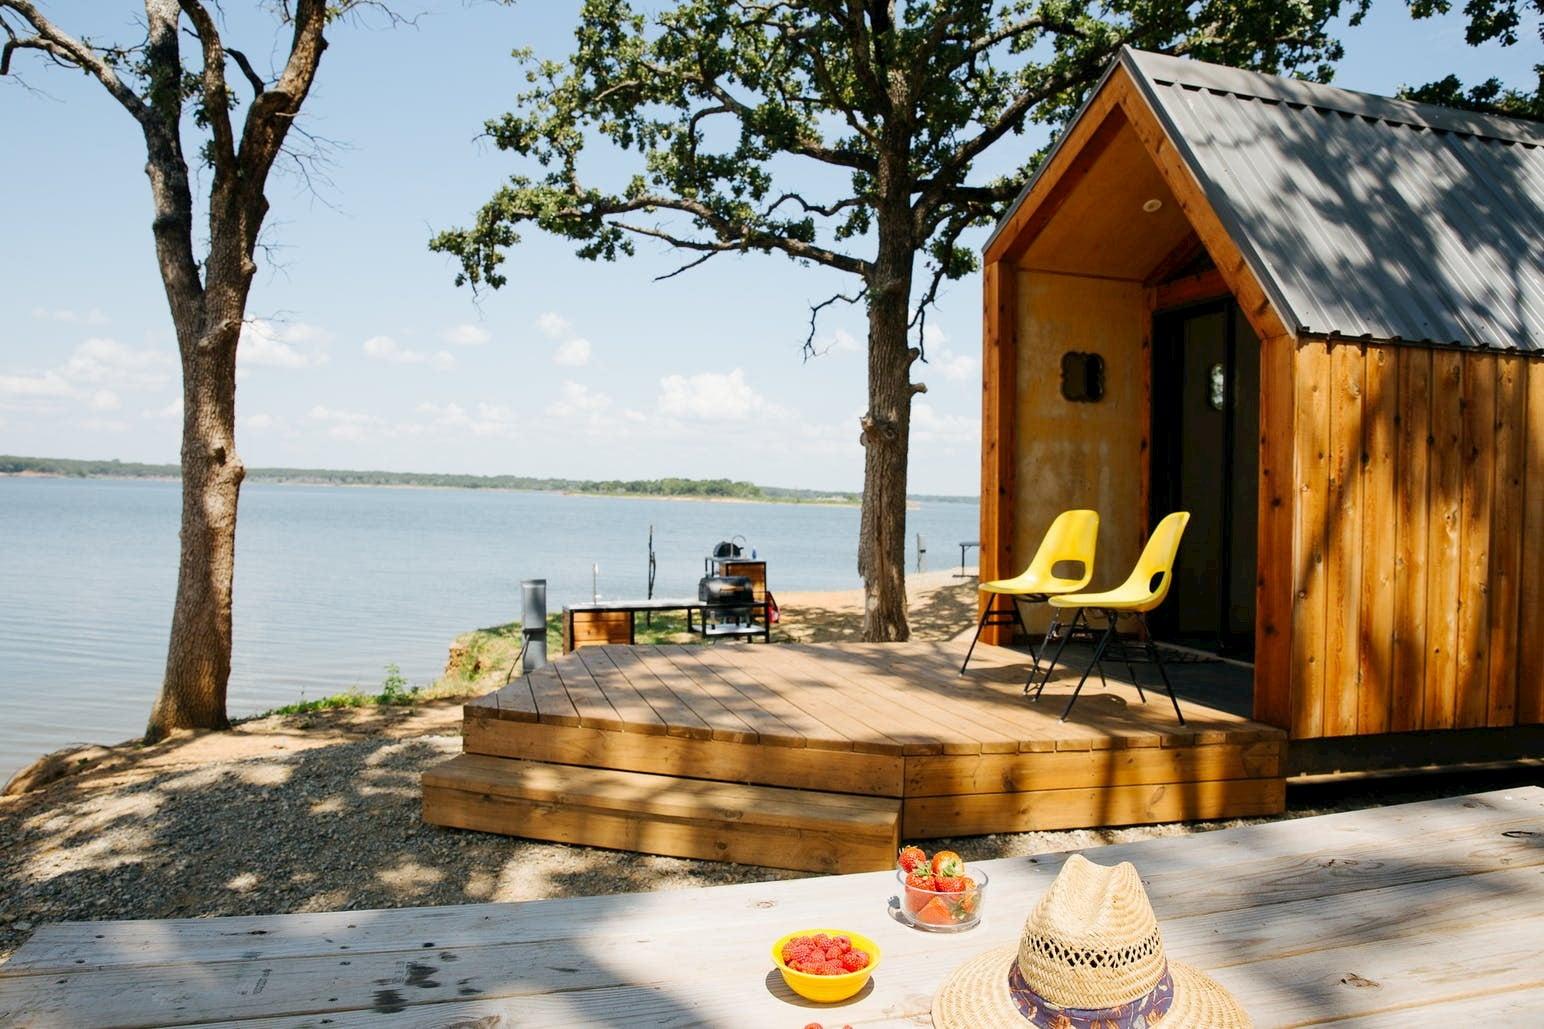 Glamping tiny house beside Lake Texoma.